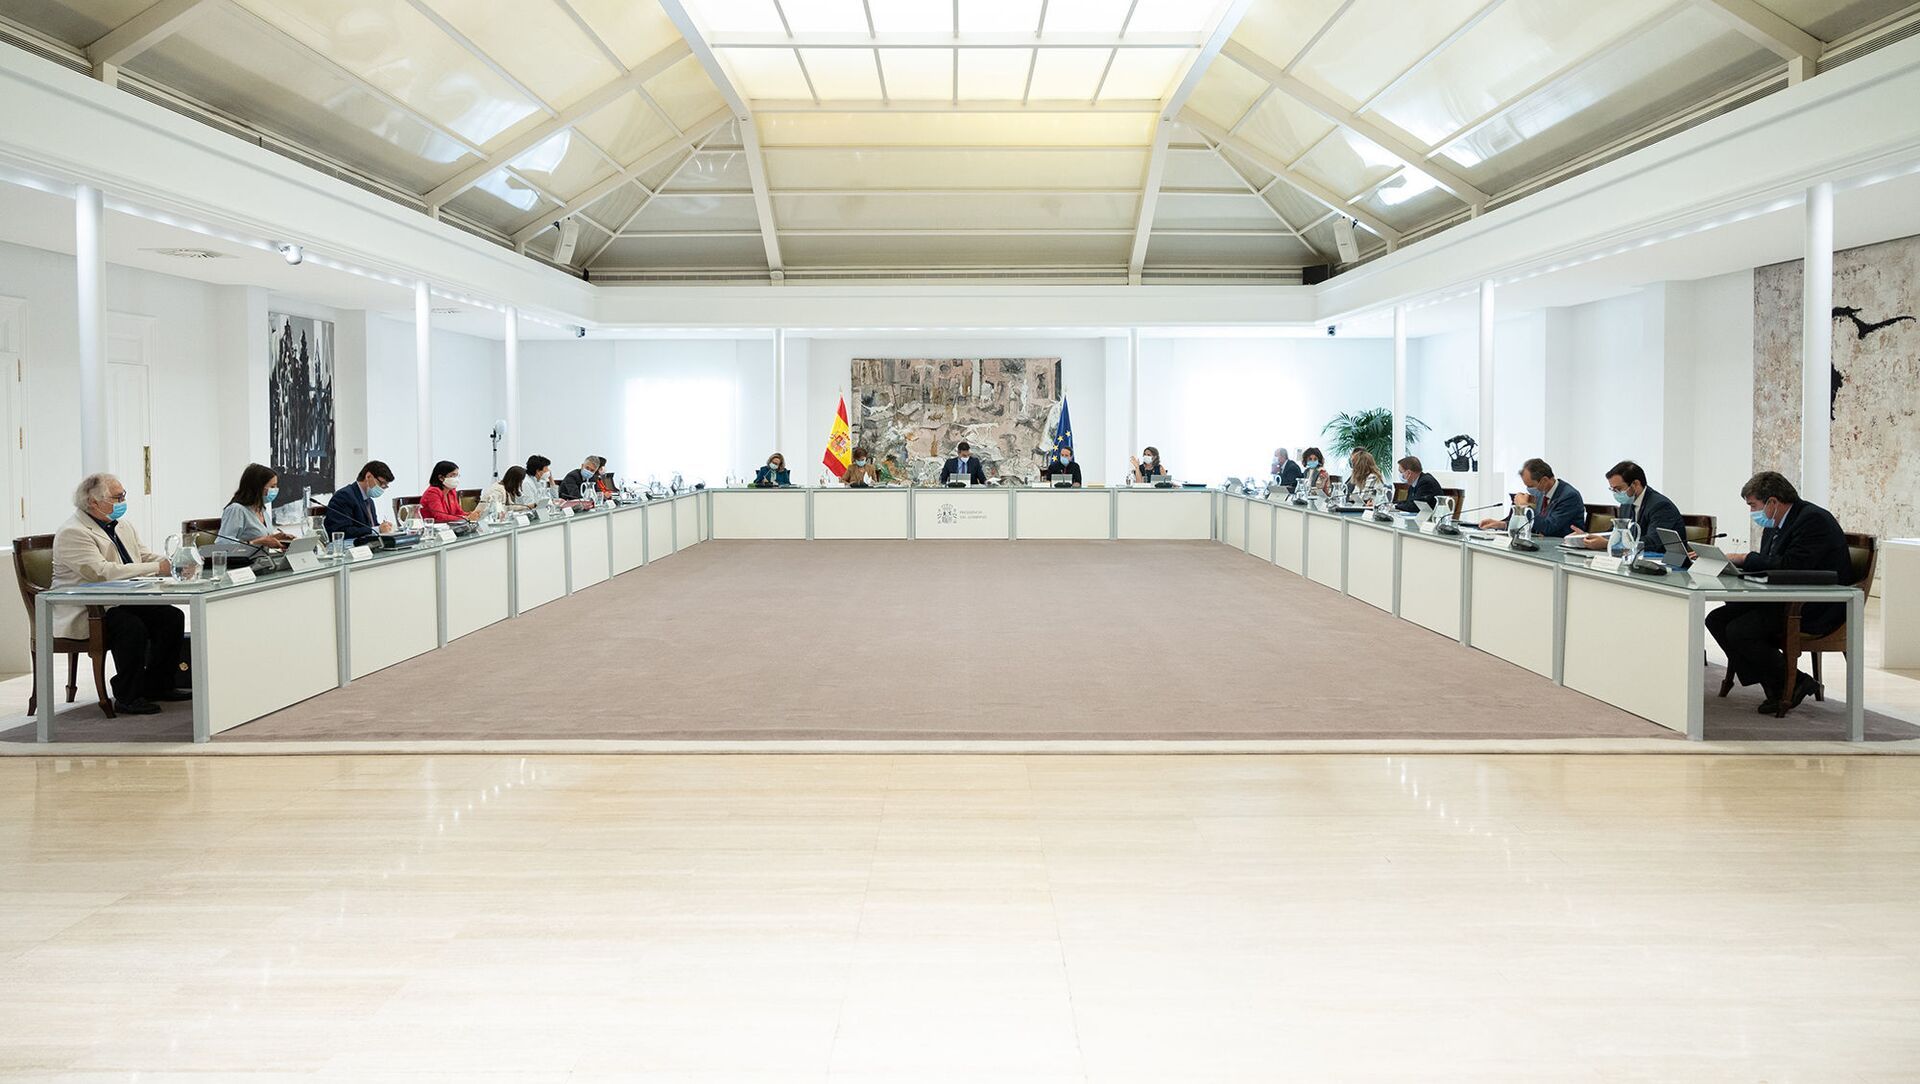 Consejo de Ministros de España - Sputnik Mundo, 1920, 15.09.2020